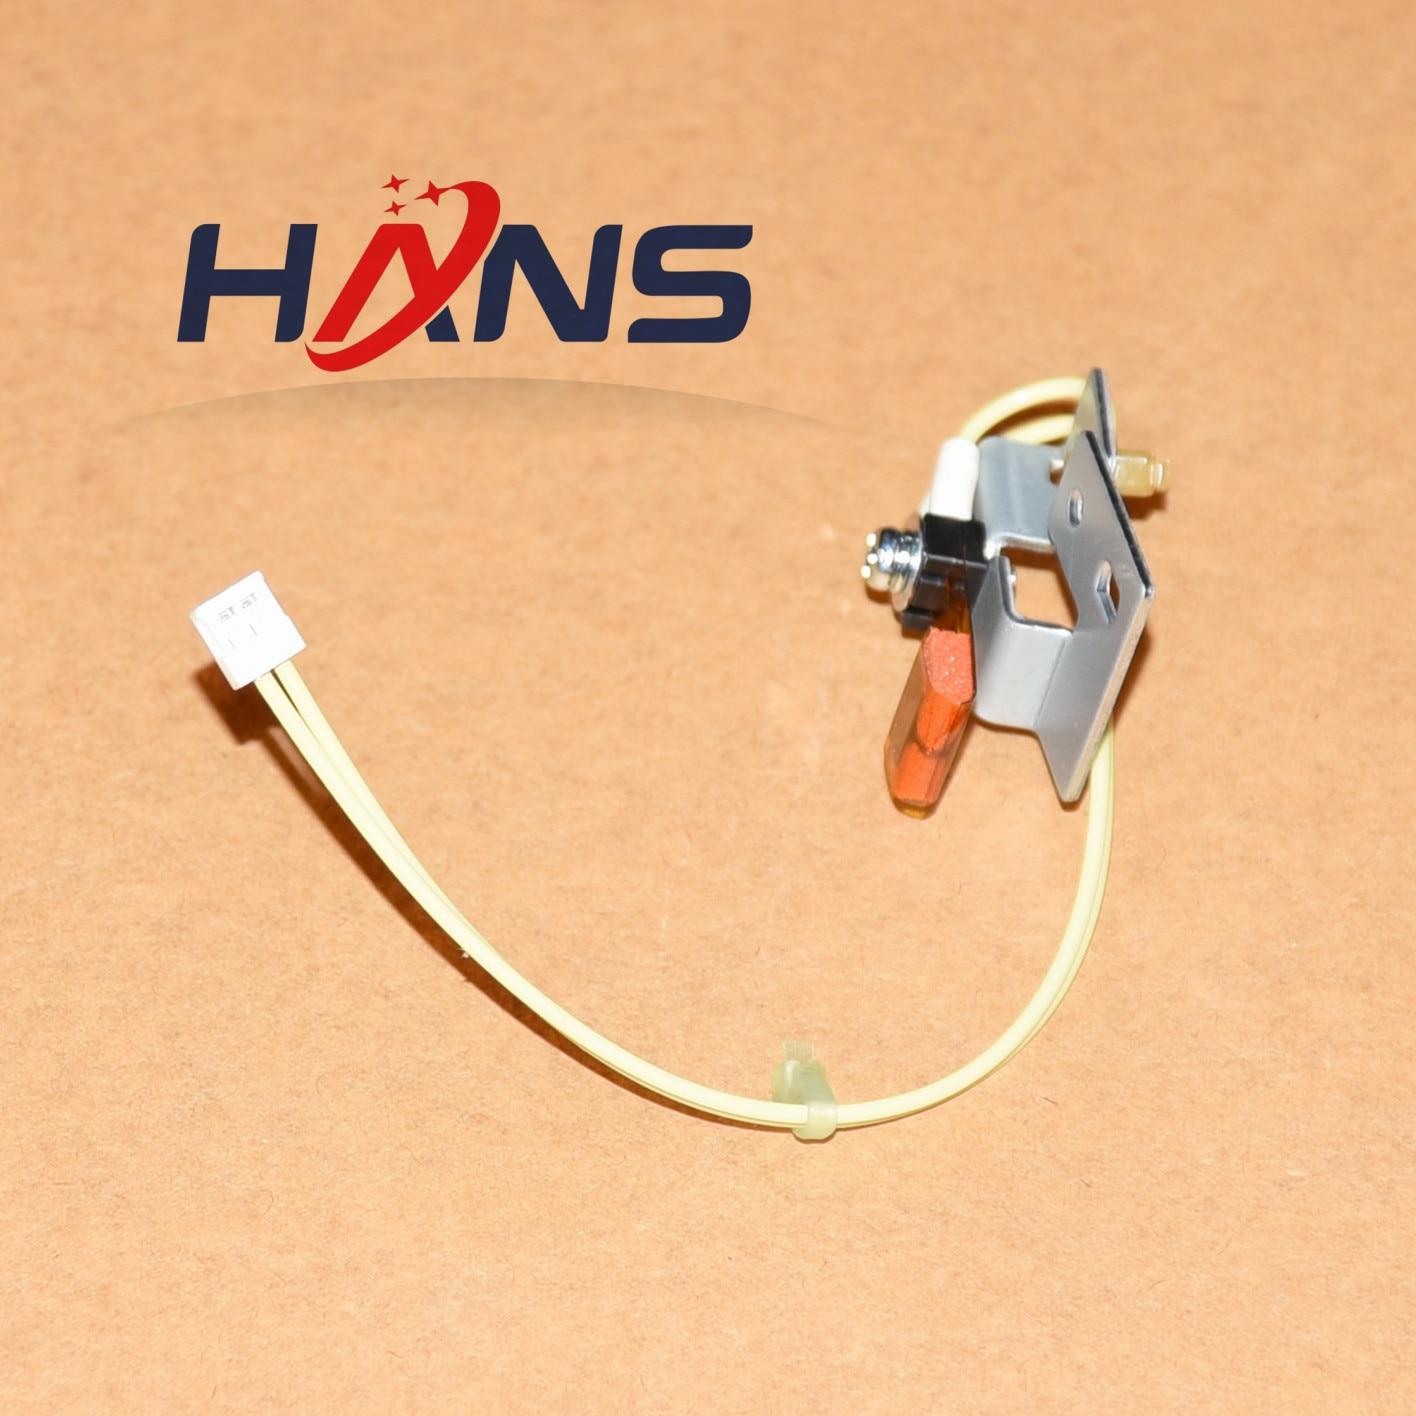 1pc A1DUR72000 A1DUR71W00 for Konica Minolta Bizhub C5500 C6500 C6501 C6000 C7000 C 5500 6500 6000